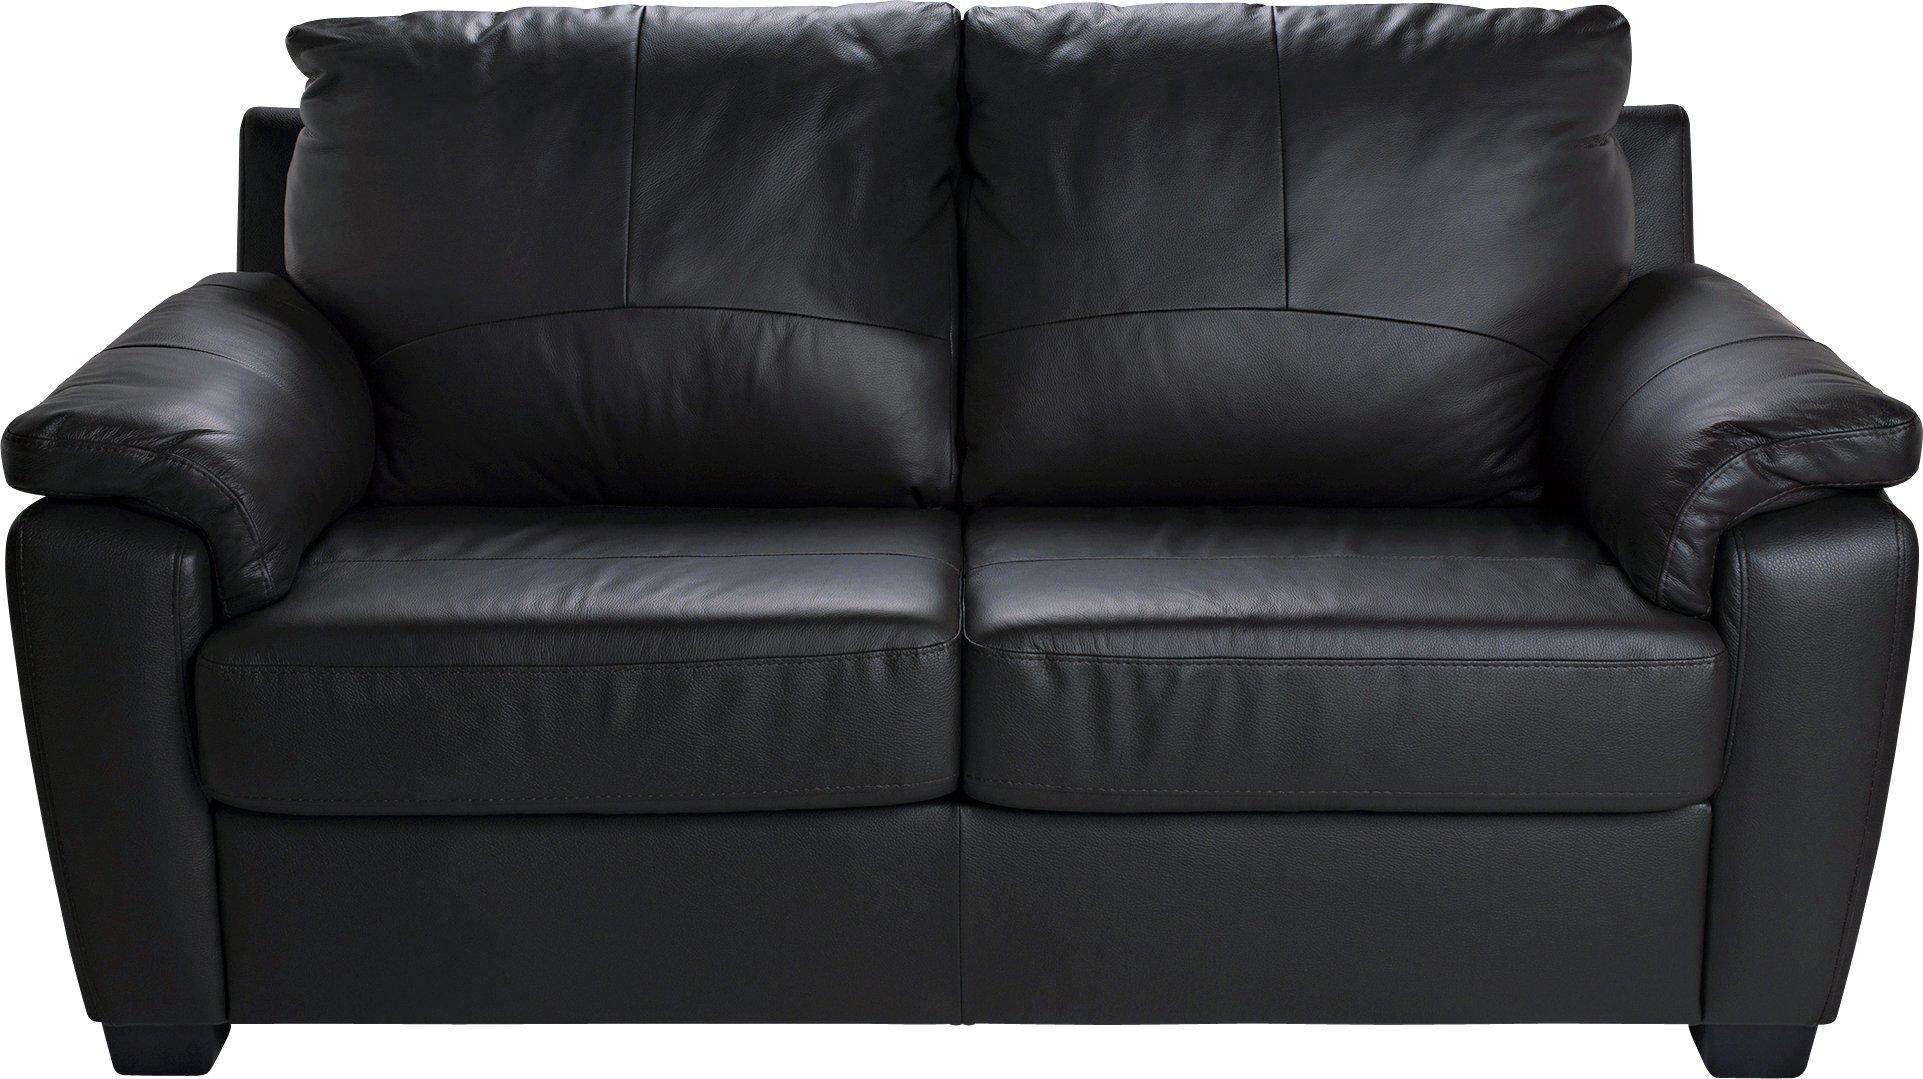 Buy HOME Antonio 2 Seater LeatherLeather Eff Sofa Bed Black at